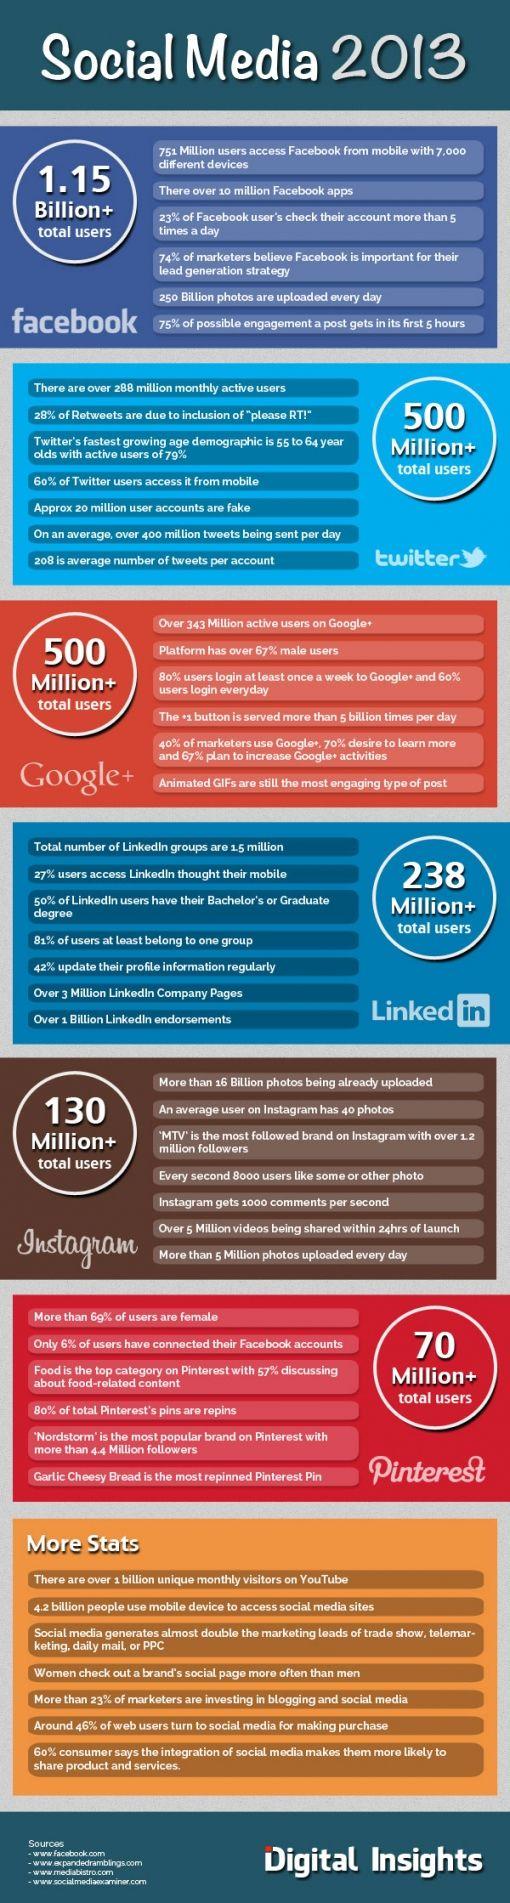 social-media-2013-infographic